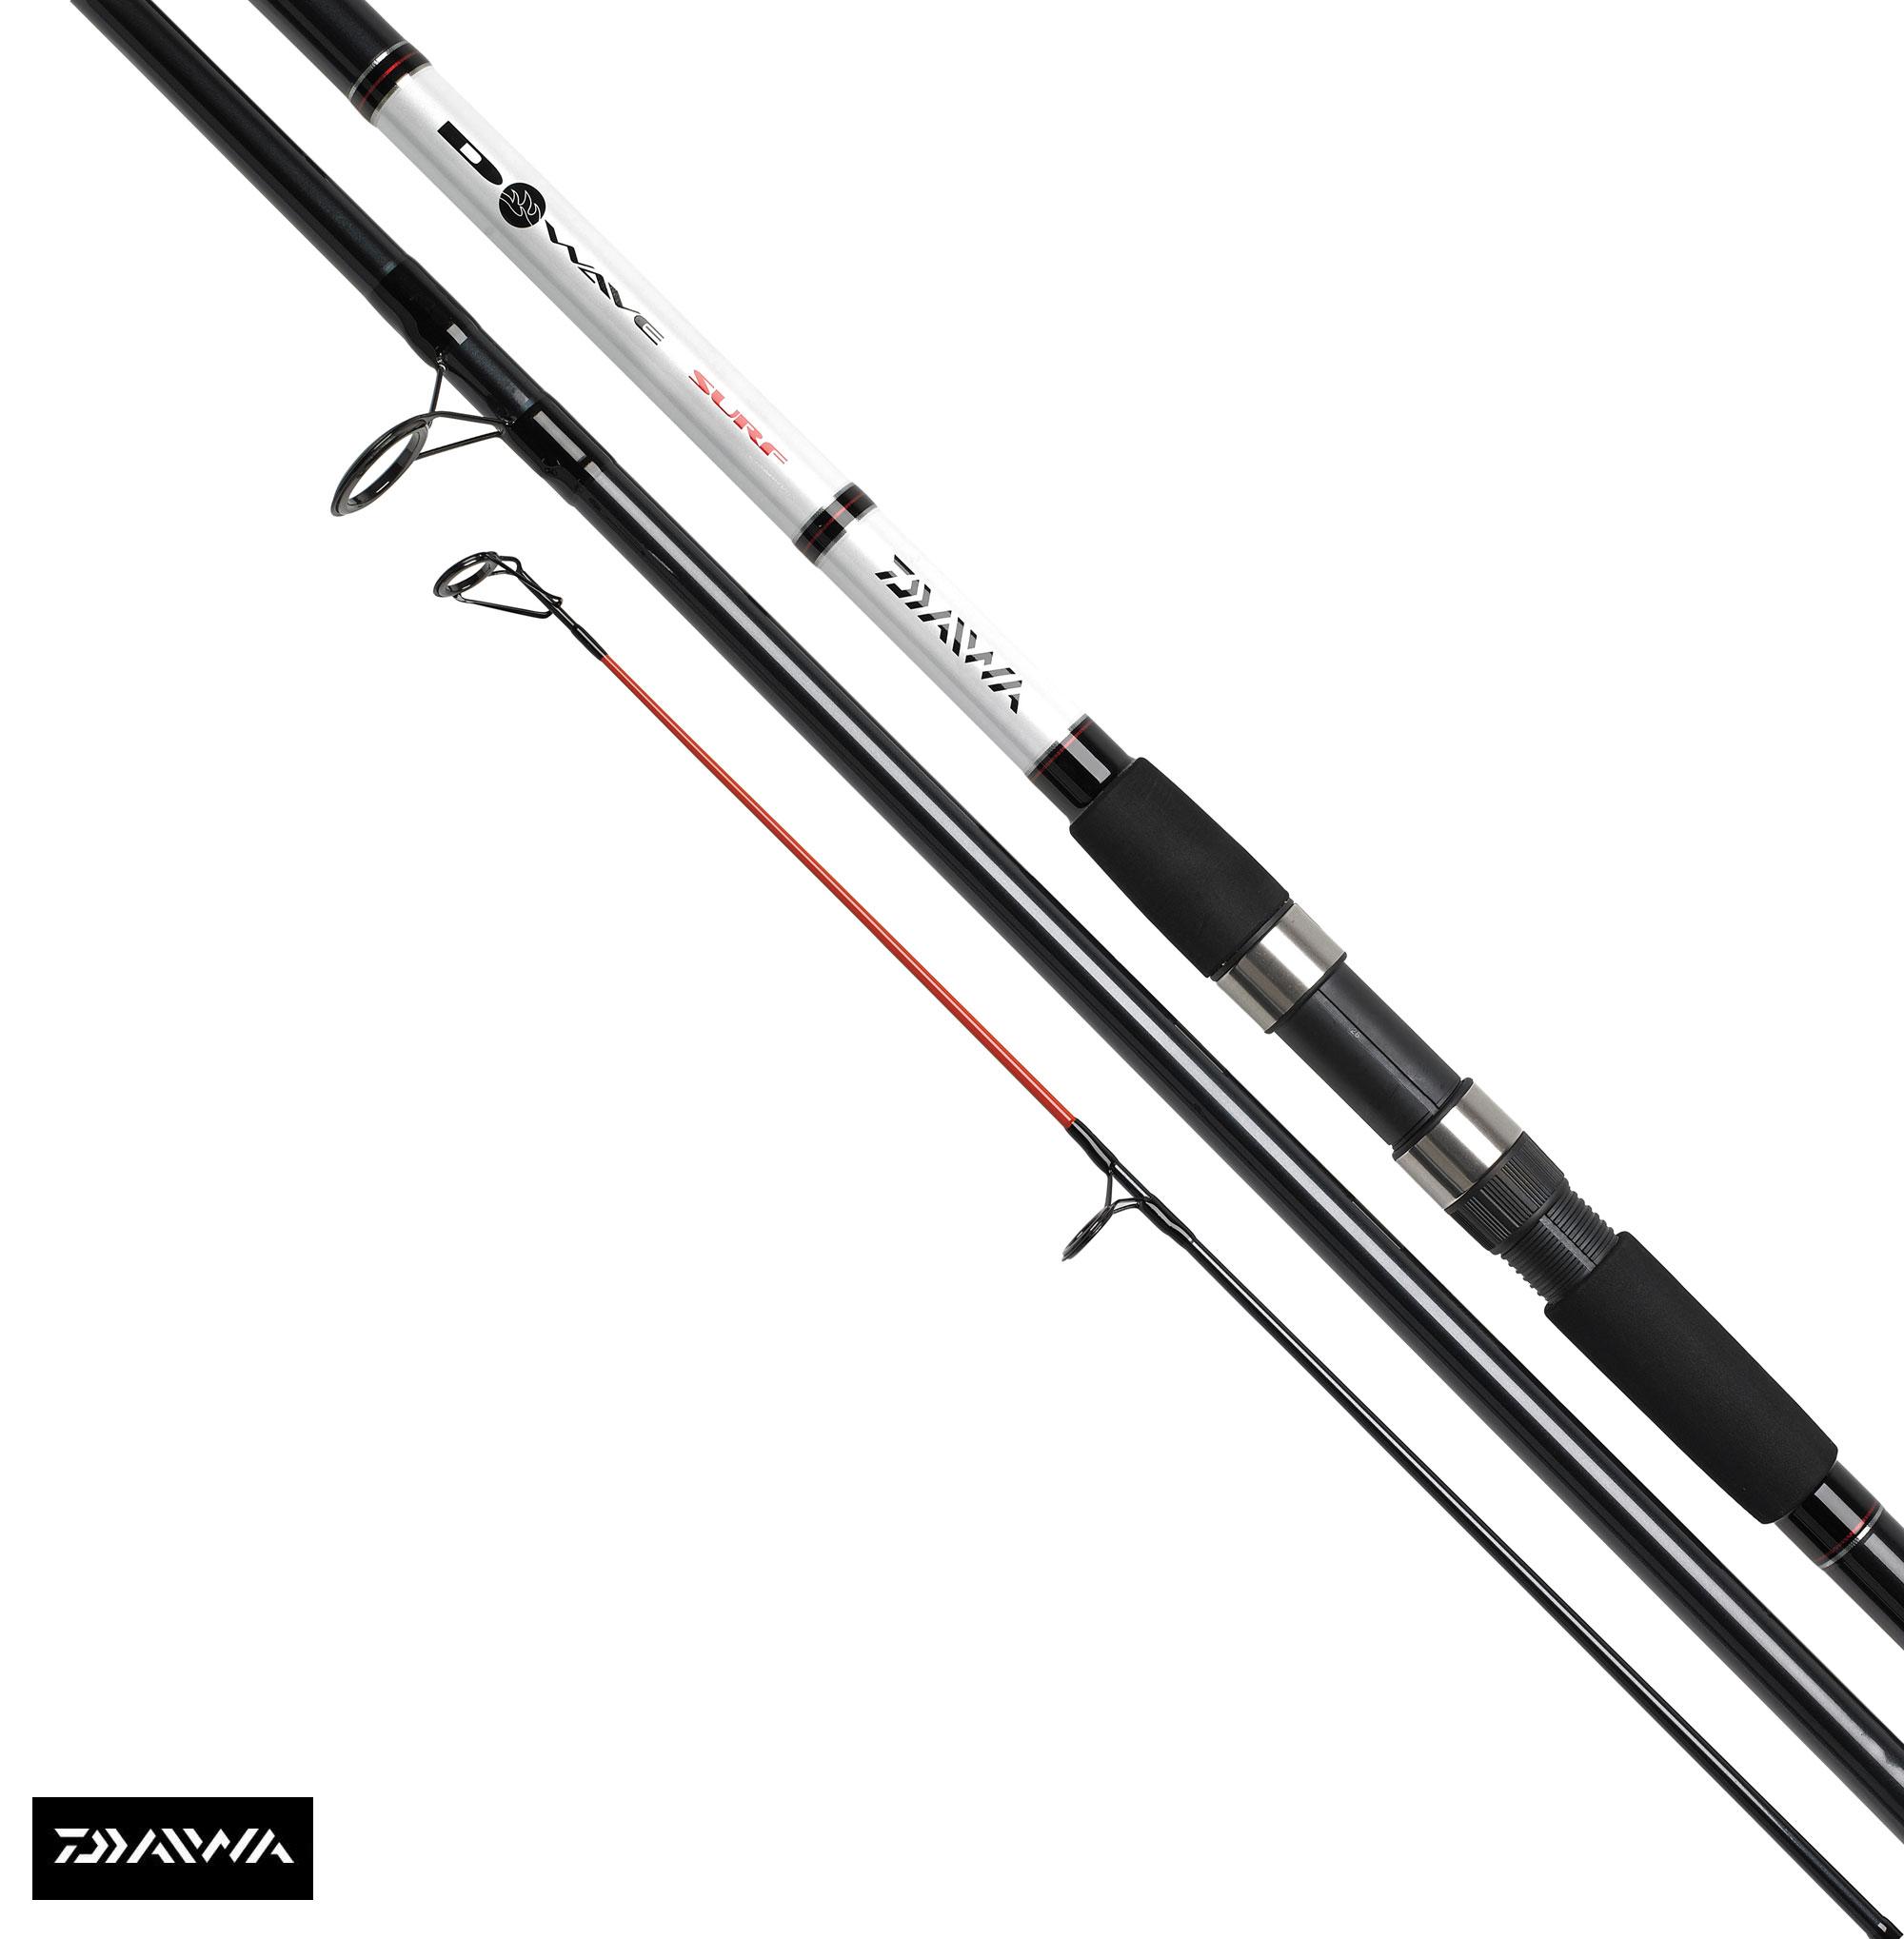 New daiwa d wave surf beach fishing rod 13 39 3pc 4 8oz for Daiwa fishing rods